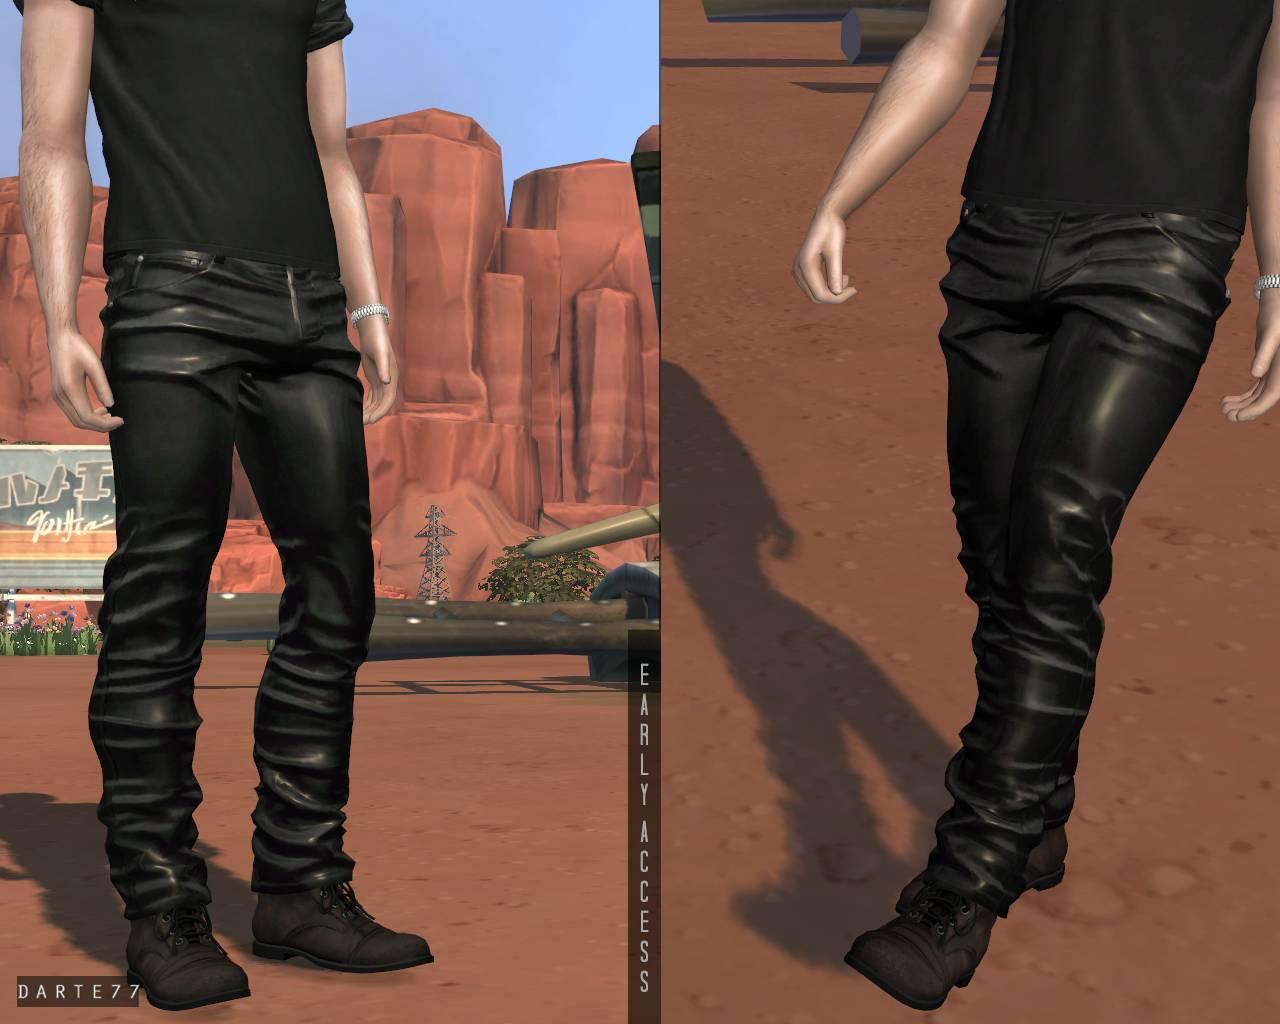 Мужские штаны - Leather Pants (V1 & V2)